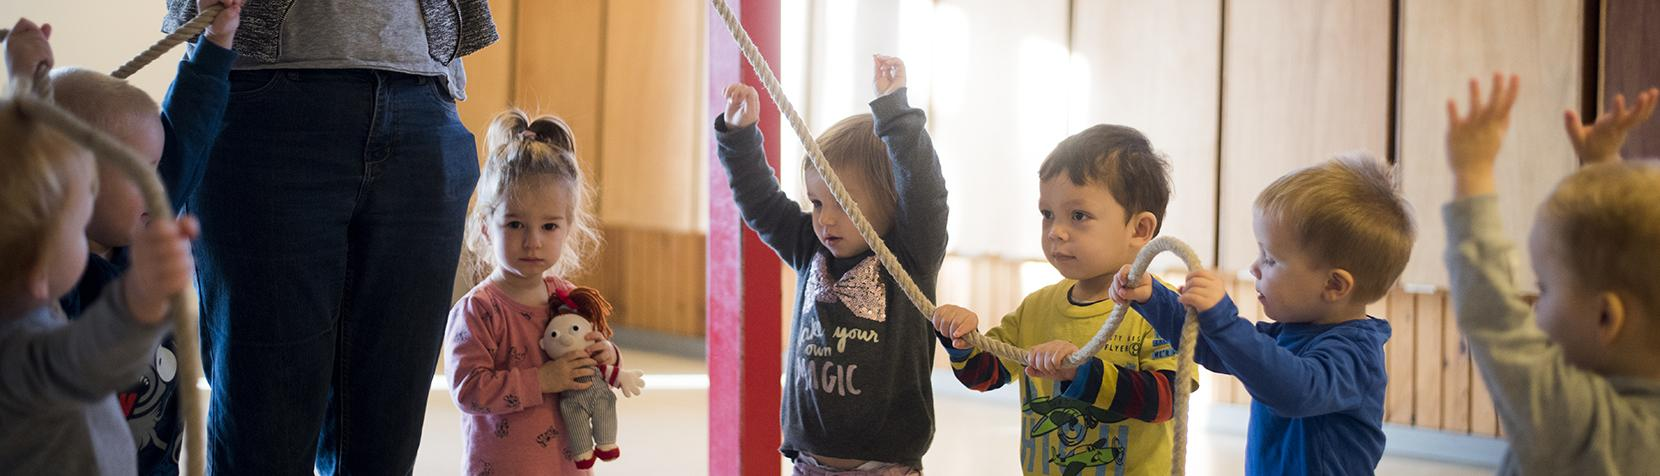 Børn og pædagog leger i rundkreds